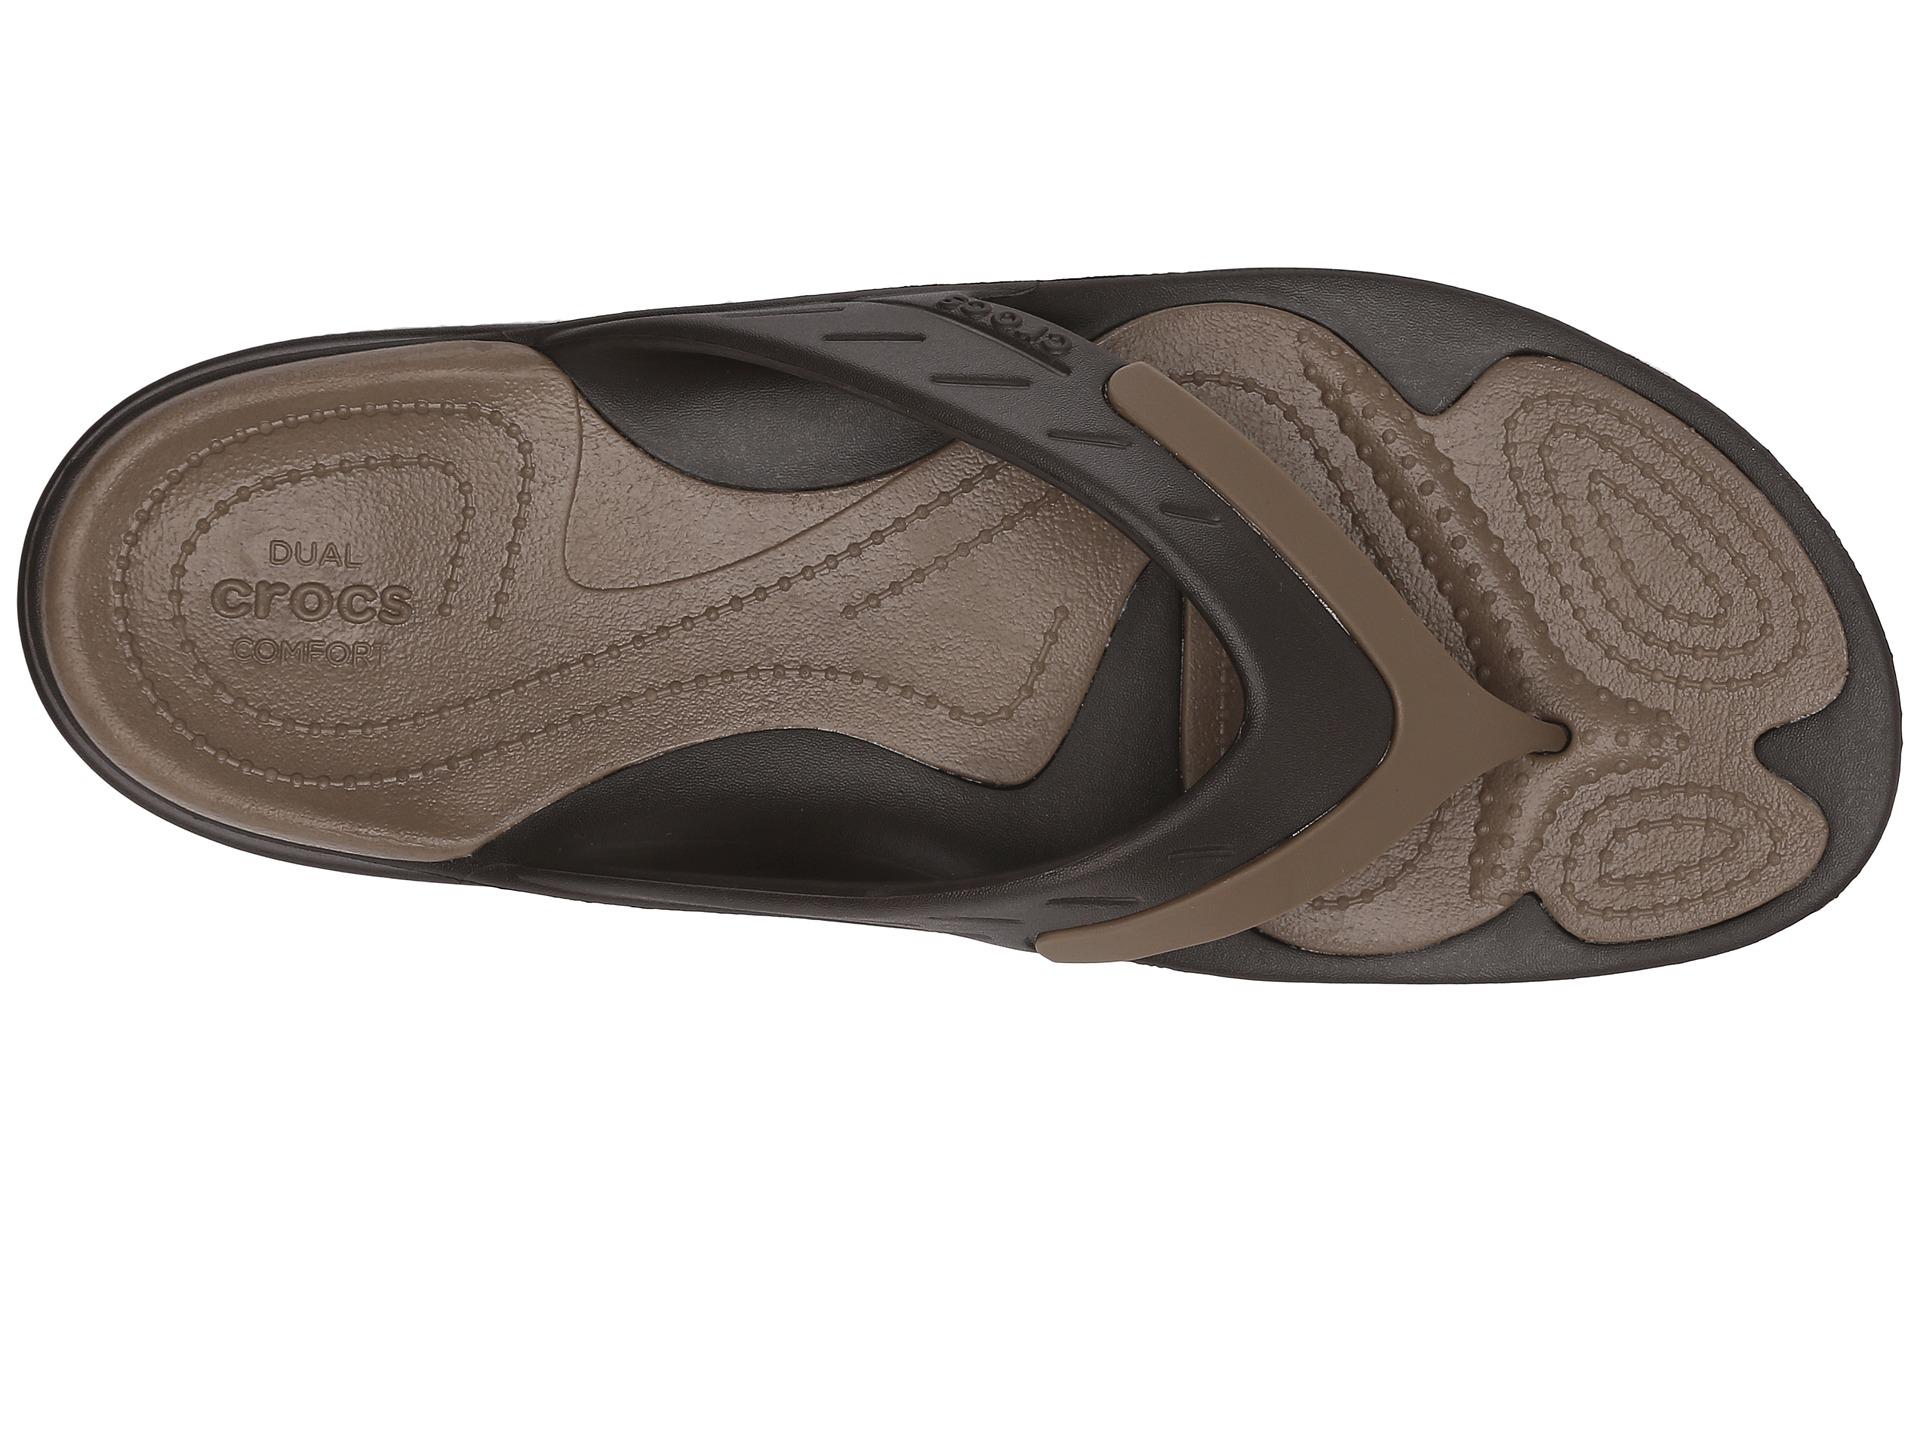 Crocs Modi Flip Flop | Croc Flipflops | Crocs Flipflops